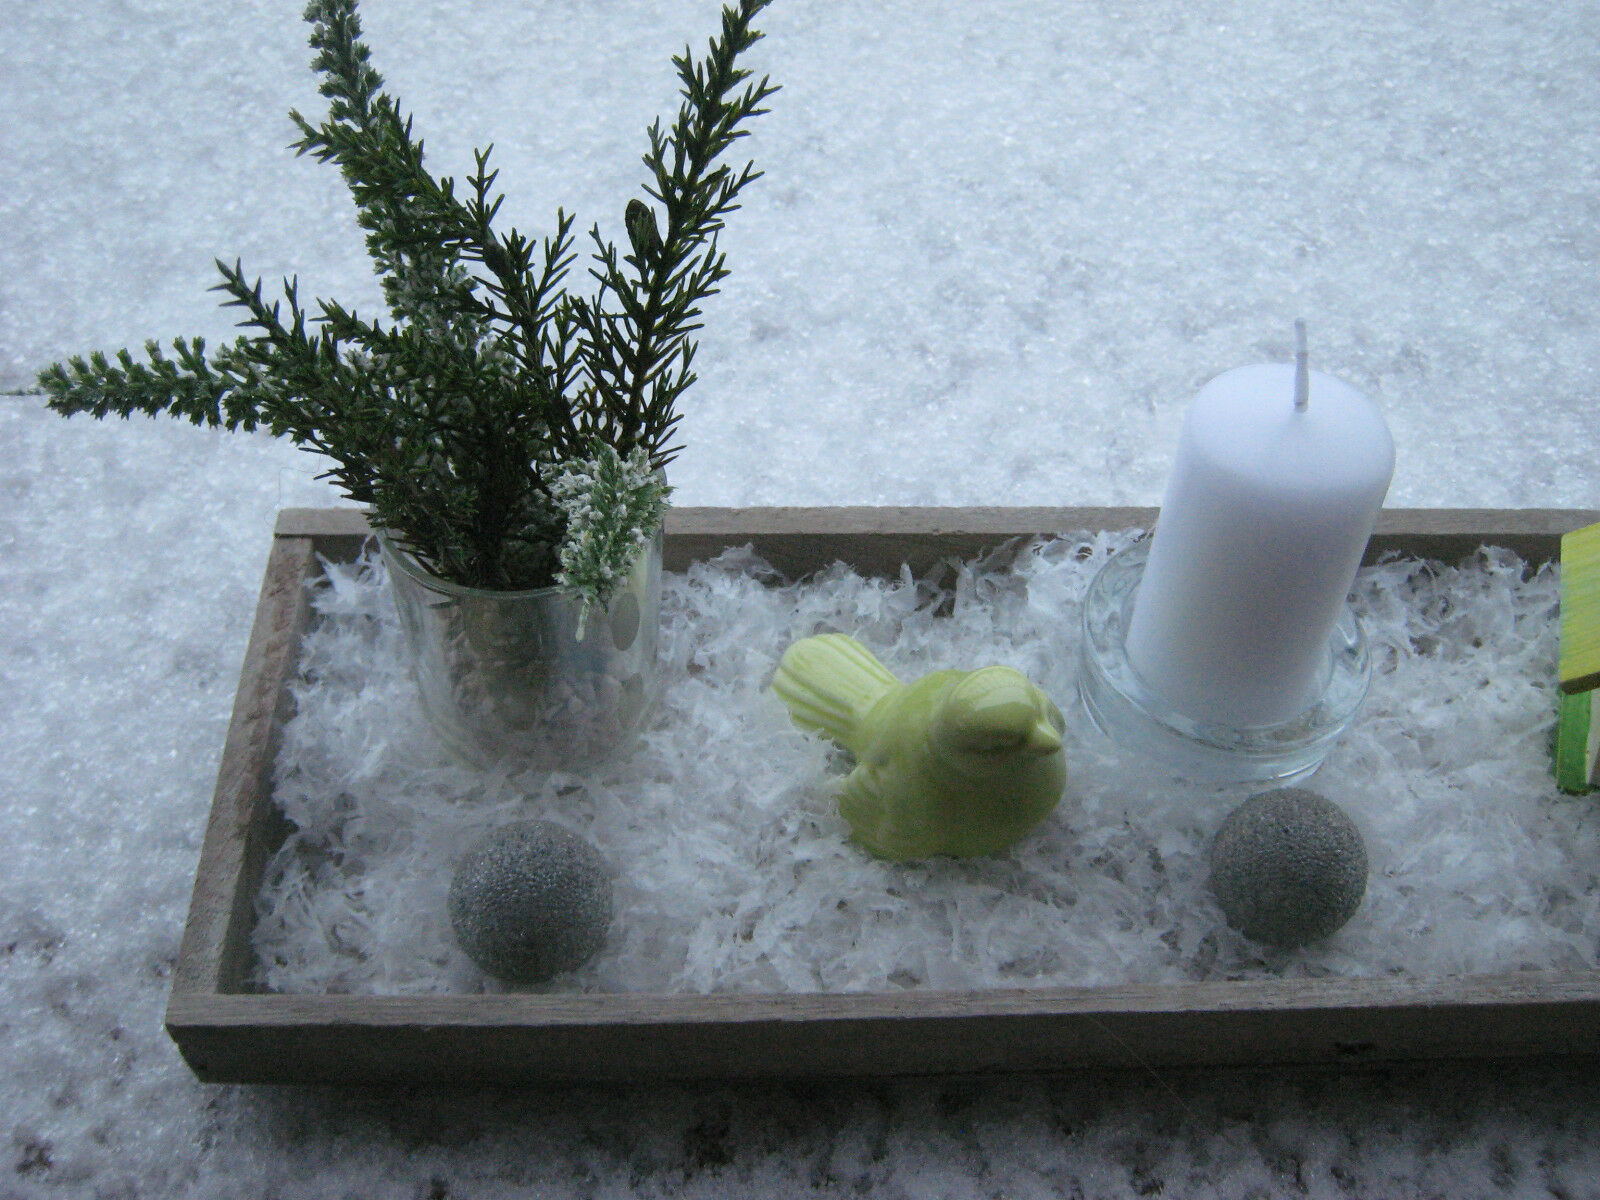 winter deko schnee dekoschale holzschale mit kerzen. Black Bedroom Furniture Sets. Home Design Ideas